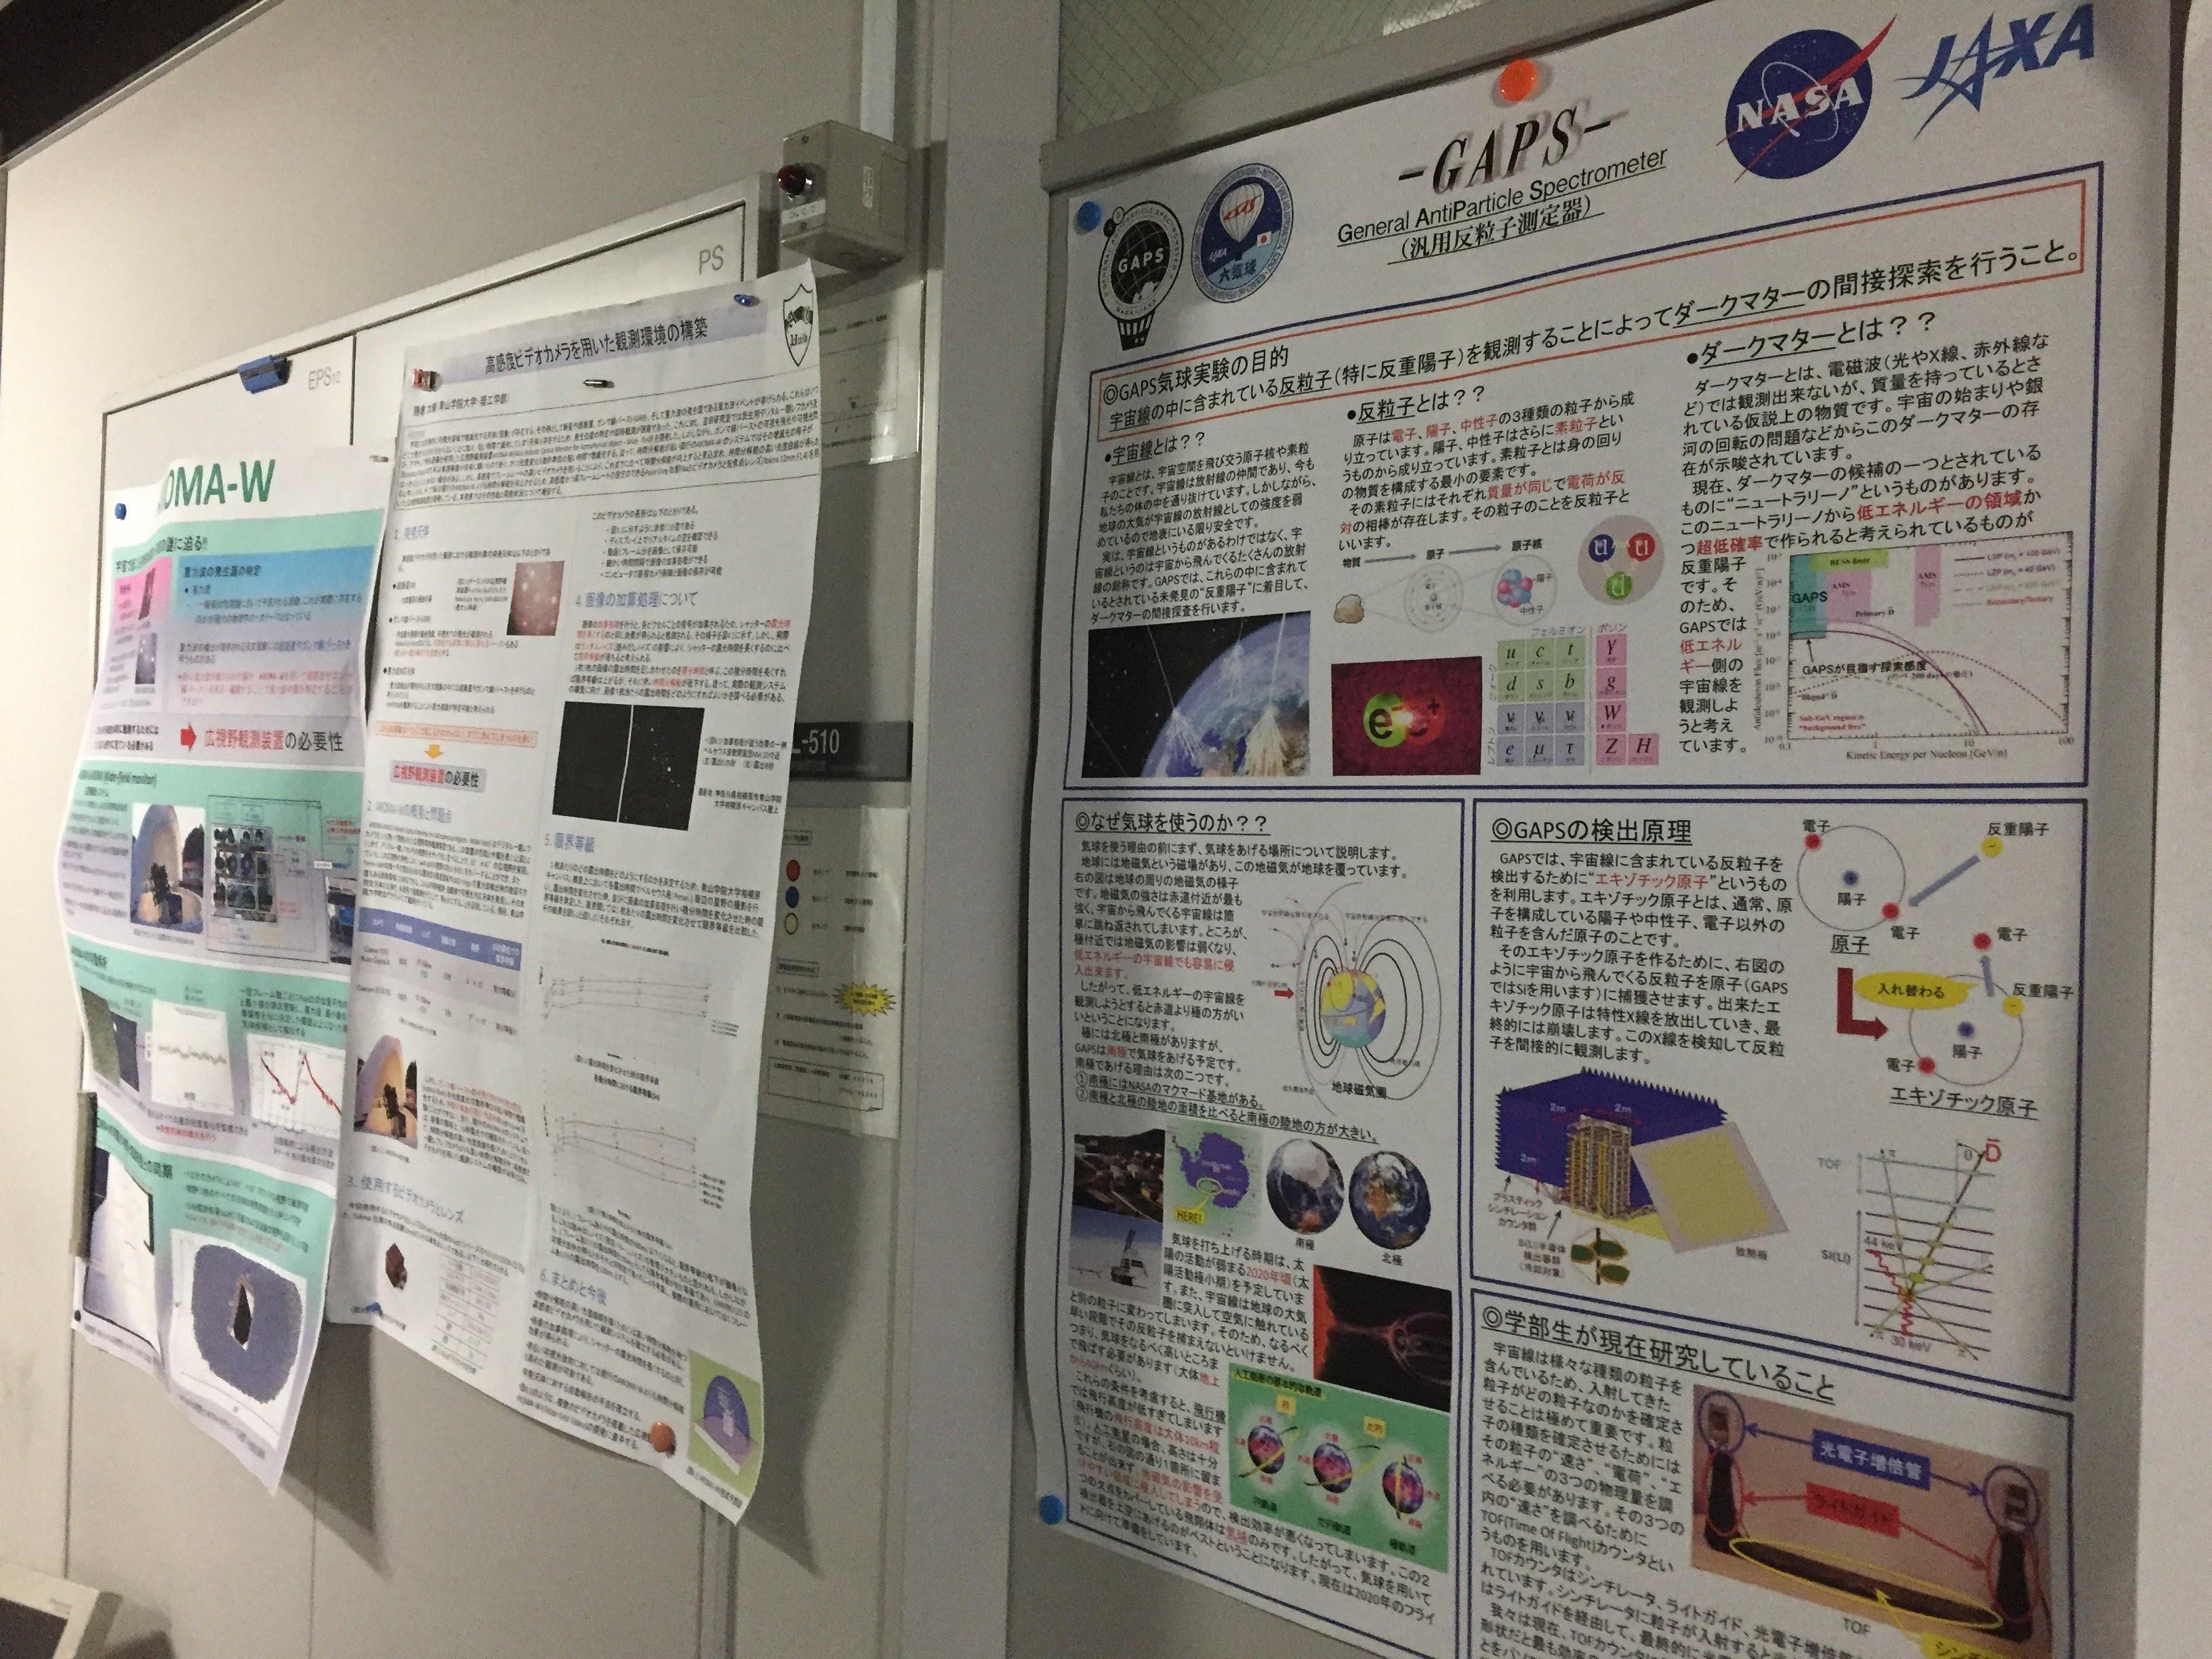 https://4310b1a9-a-c2f1267d-s-sites.googlegroups.com/a/yoshida-agu.net/home/dairy-of-yoshida-lab/20151111/IMG_2567.jpg?attachauth=ANoY7craDaMduuYoaZjPGgo_5bMzJlGrog85z_d8uhJKiK2qNBYKXPhsq6102sjQfCW24DKkULILU-AjITA2C9tznYt20RblGJUpxhRY2OUreDYwl3nHTaOmadpoP1kTxQpdJ9cmCpoExk8gvY-rAOx0RrrHABxaeeWBOXphqMdZWMingjhuwUfin07yDLRnC50pKVfy85D-3YGb2Pfbnw07yyDXBrxeQYg1OtaYX6C6uPHS9jSuhCvMKzOwJGrVQ8-GKzapI8WF&attredirects=0